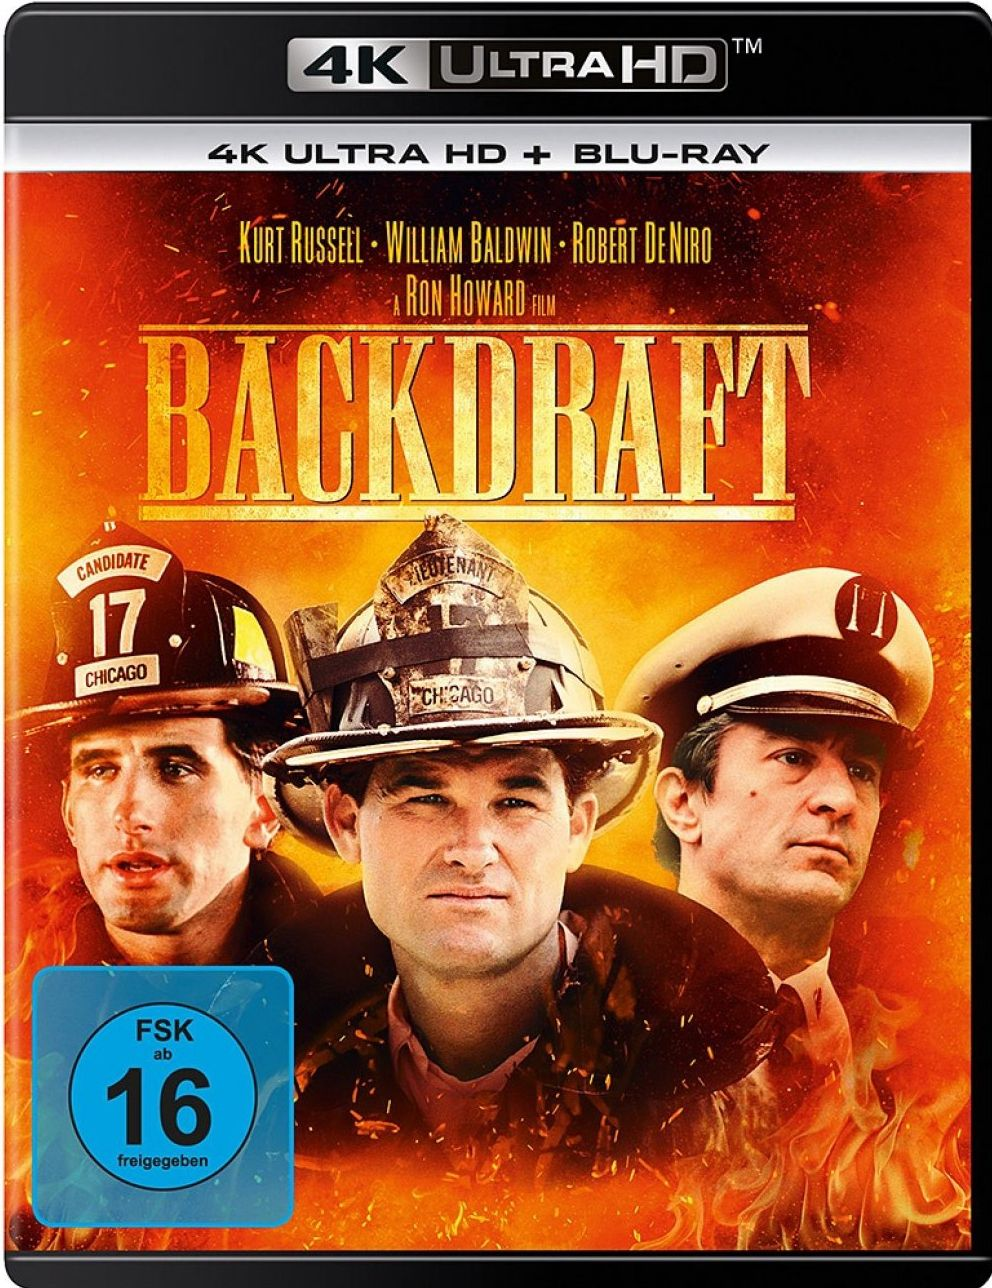 Backdraft (2 Discs) (UHD BLURAY + BLURAY)